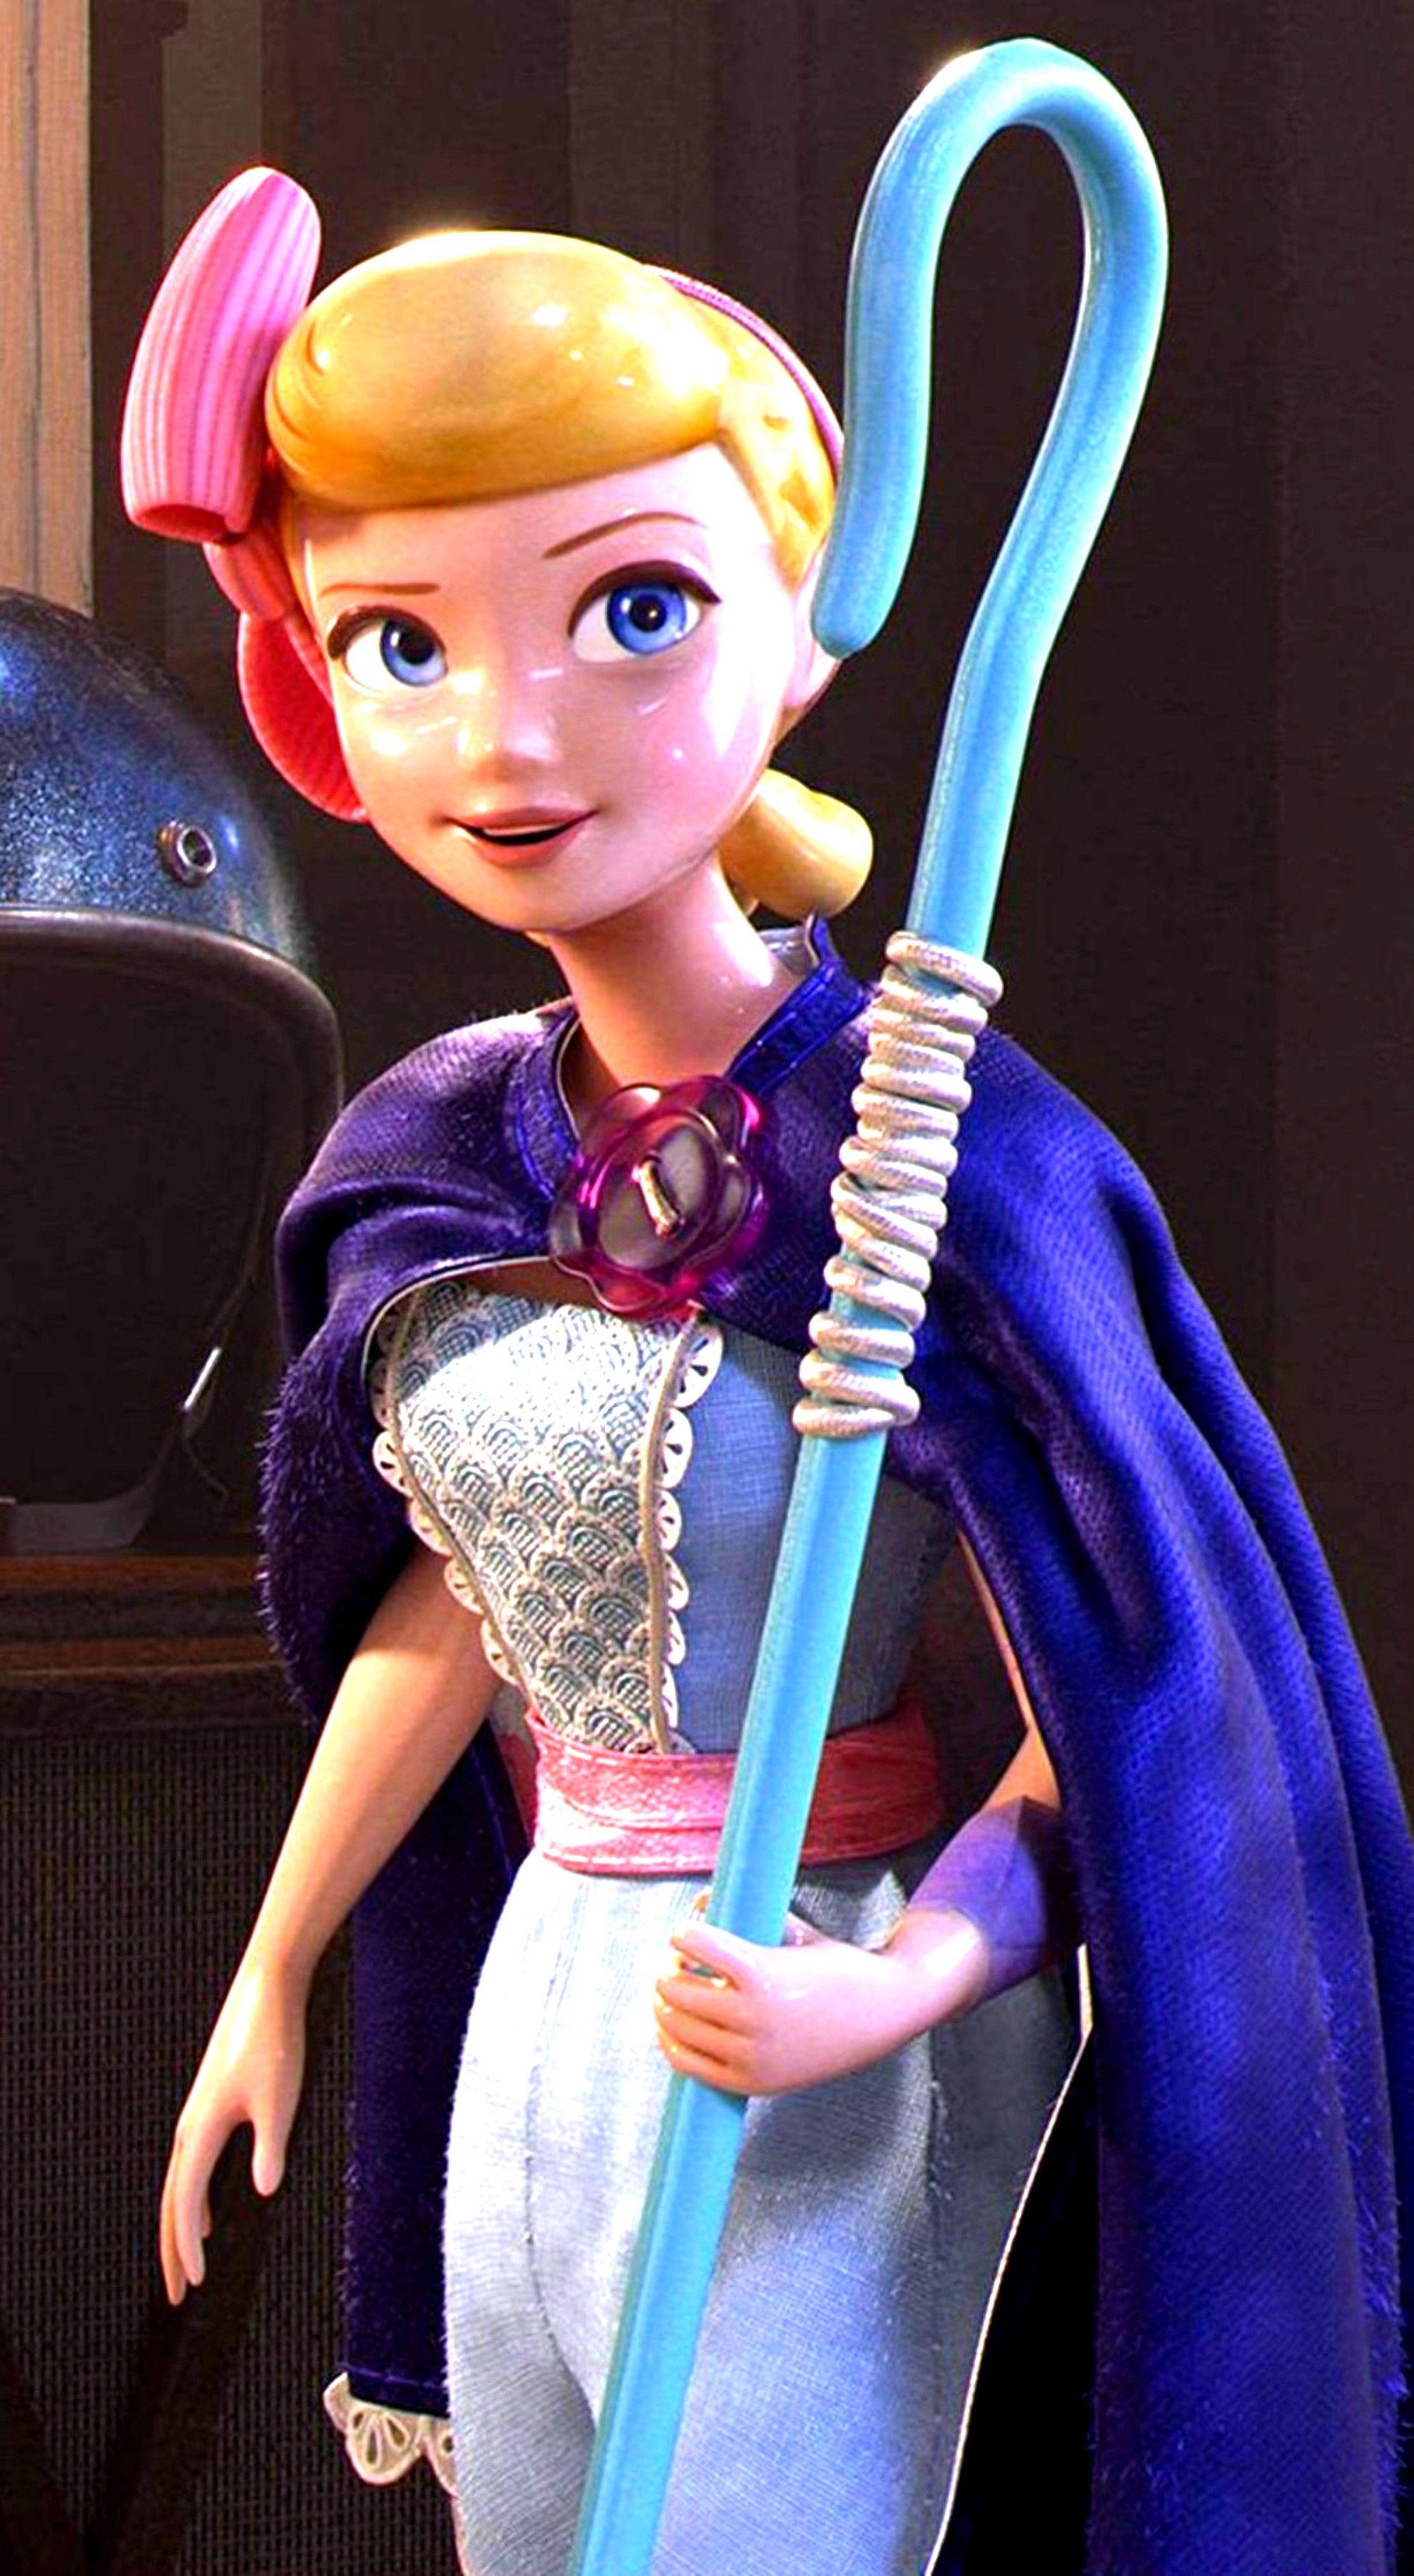 Little Bo Peep Bo Peep Toy Story Toy Story Movie Jessie Toy Story